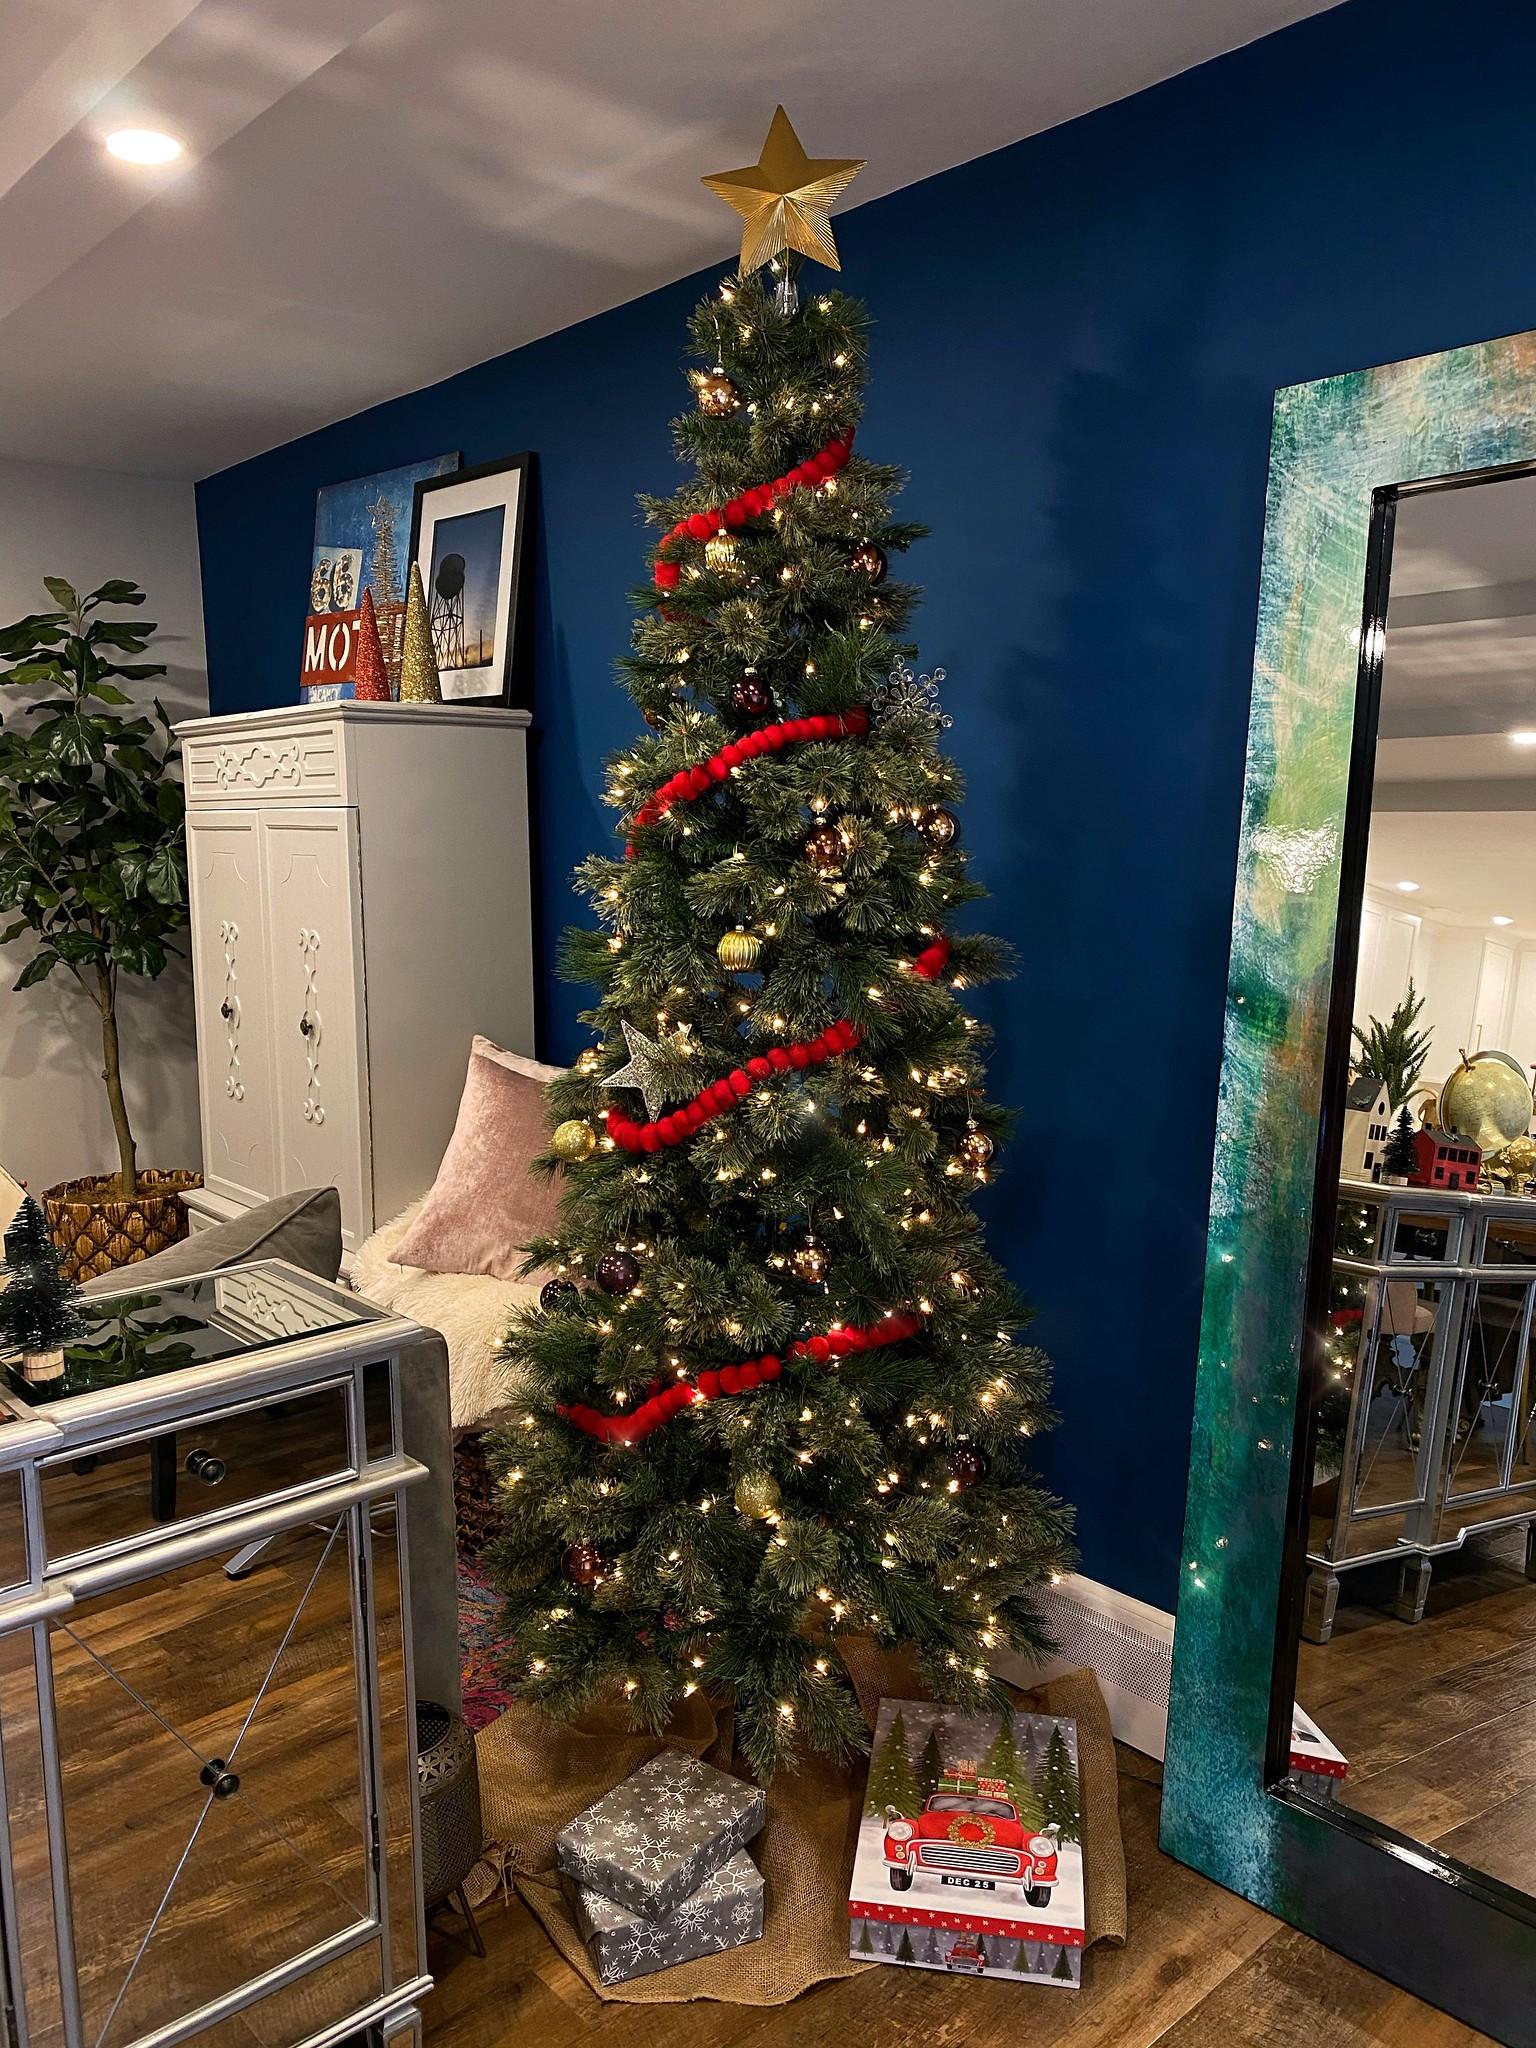 7.5ft Pre-lit Artificial Christmas Tree Slim Virginia Pine with Clear Lights - Wondershop - Apartment Size Christmas Tree - Small Space Christmas Tree